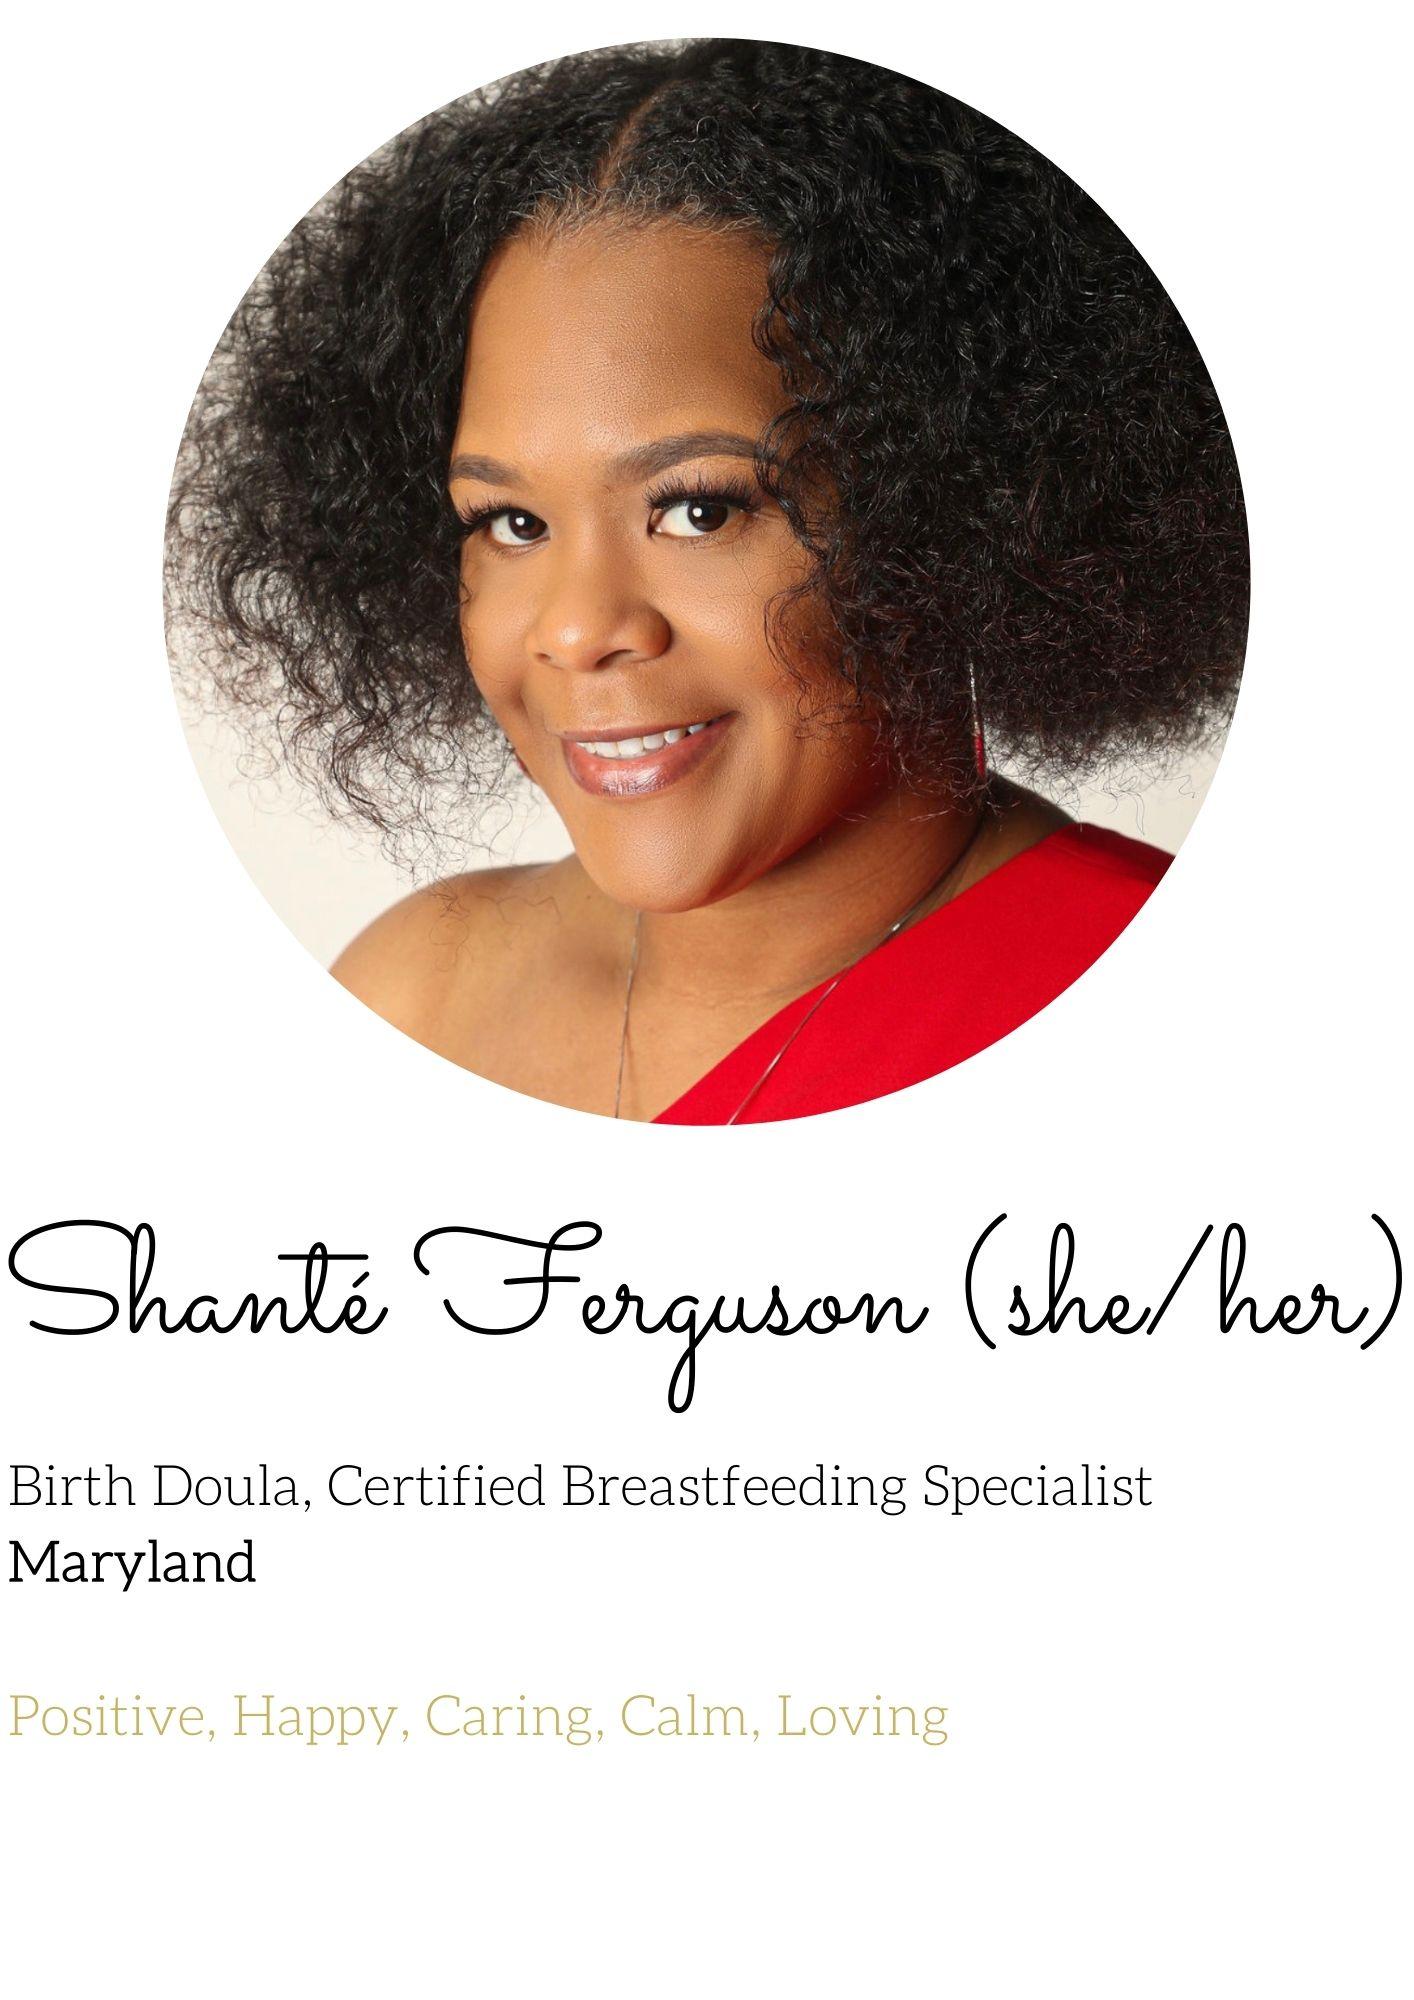 Shante Ferguson she/her birth doula breastfeeding specialist Maryland positive happy caring calm loving